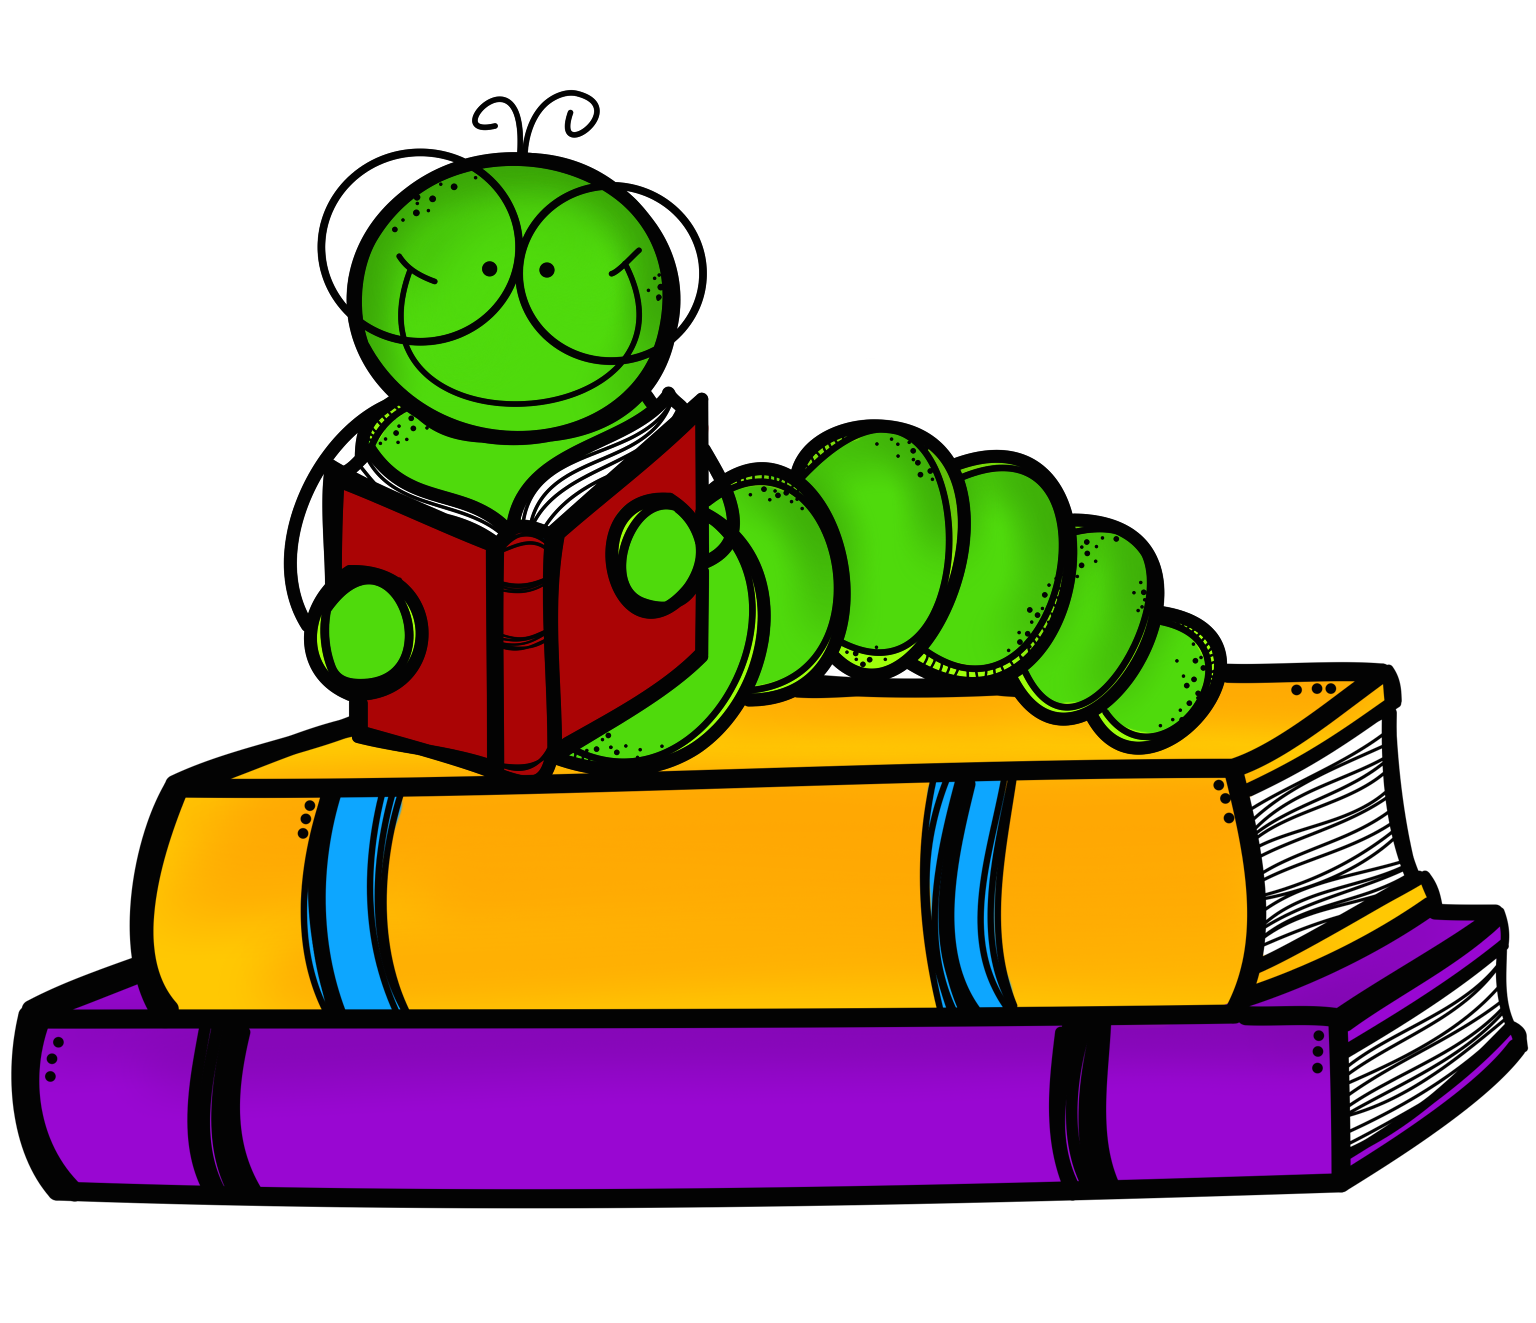 Book worm clip art cliparts co